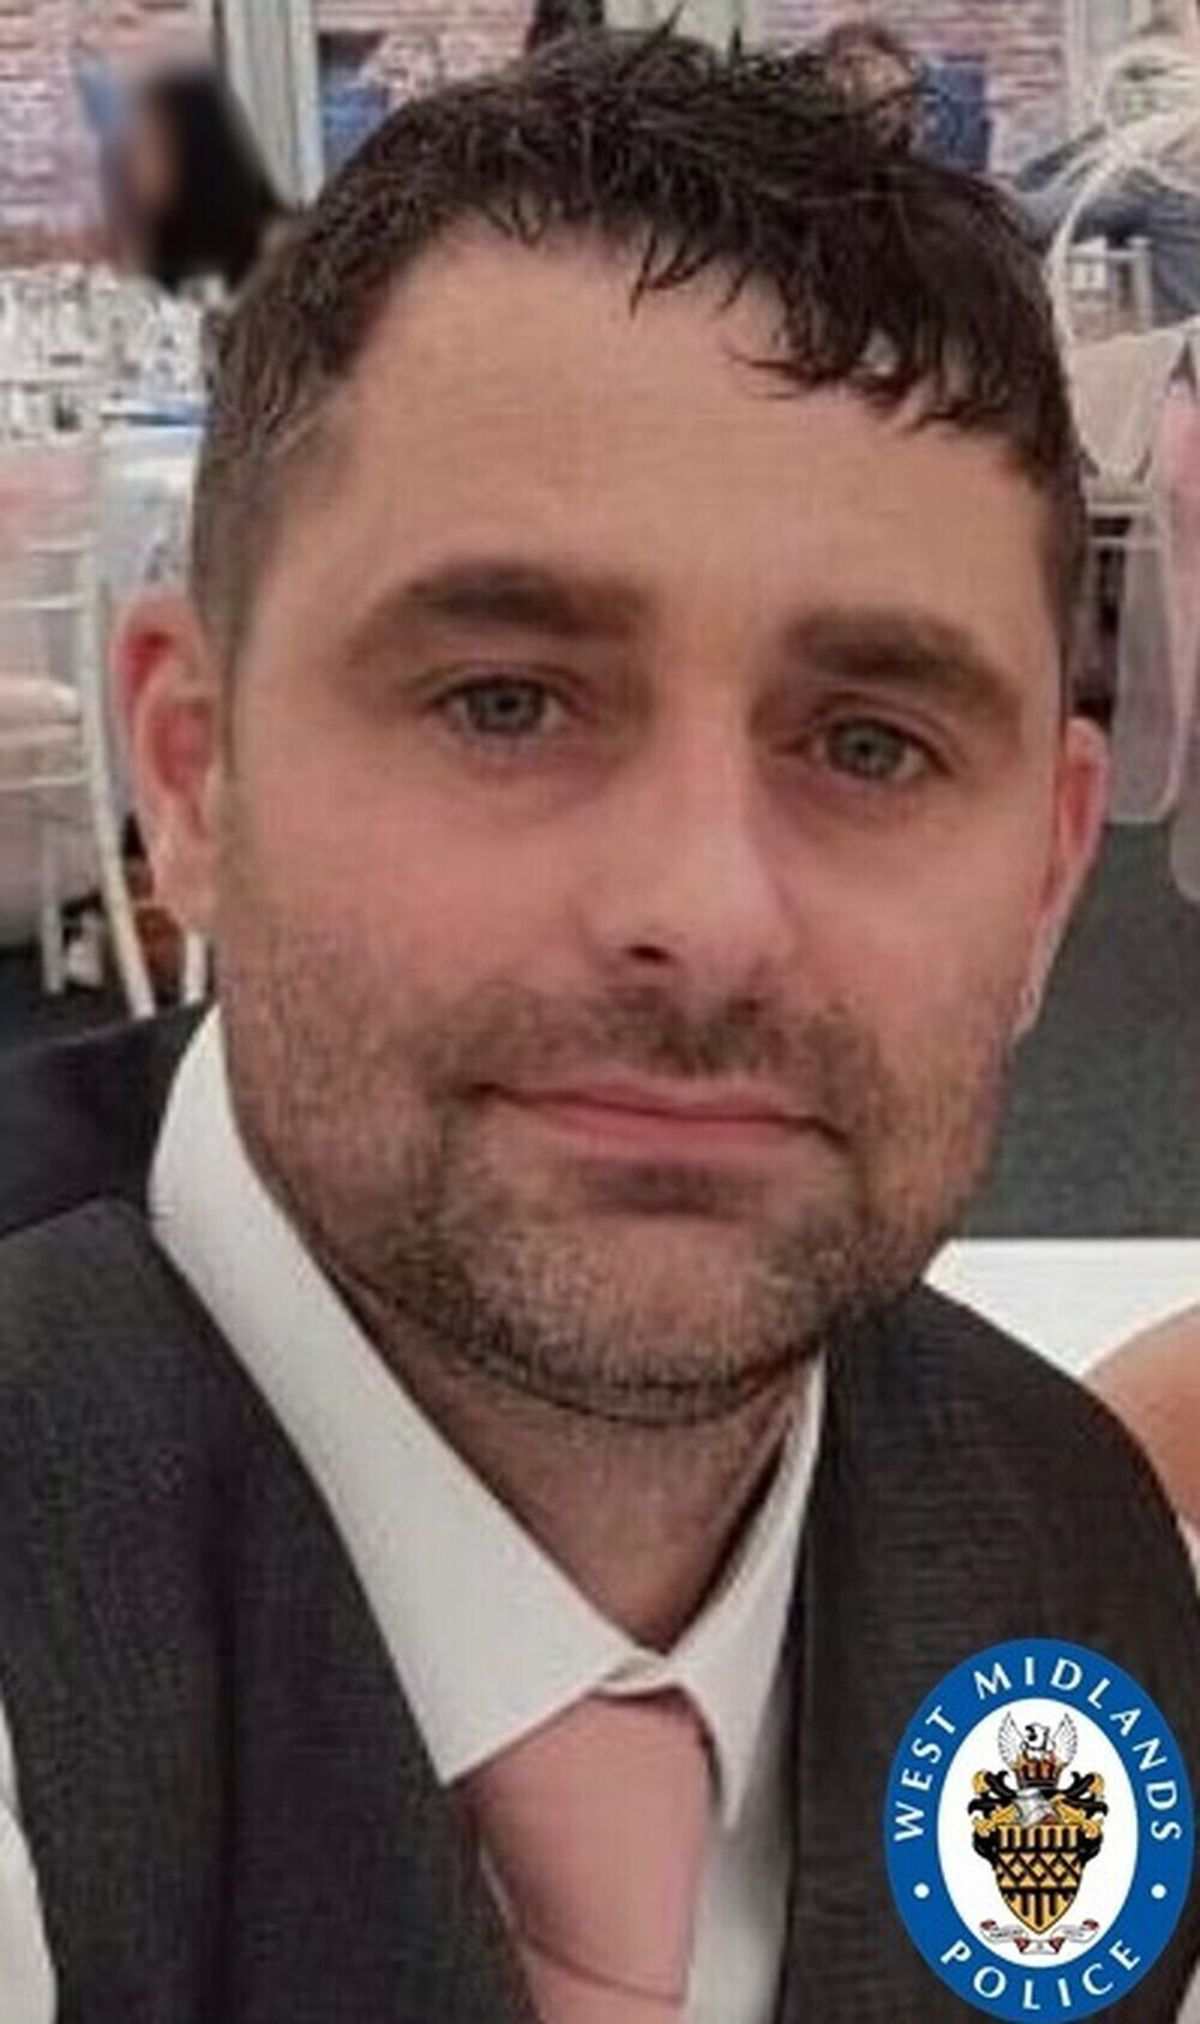 Victim Mark Lloyd